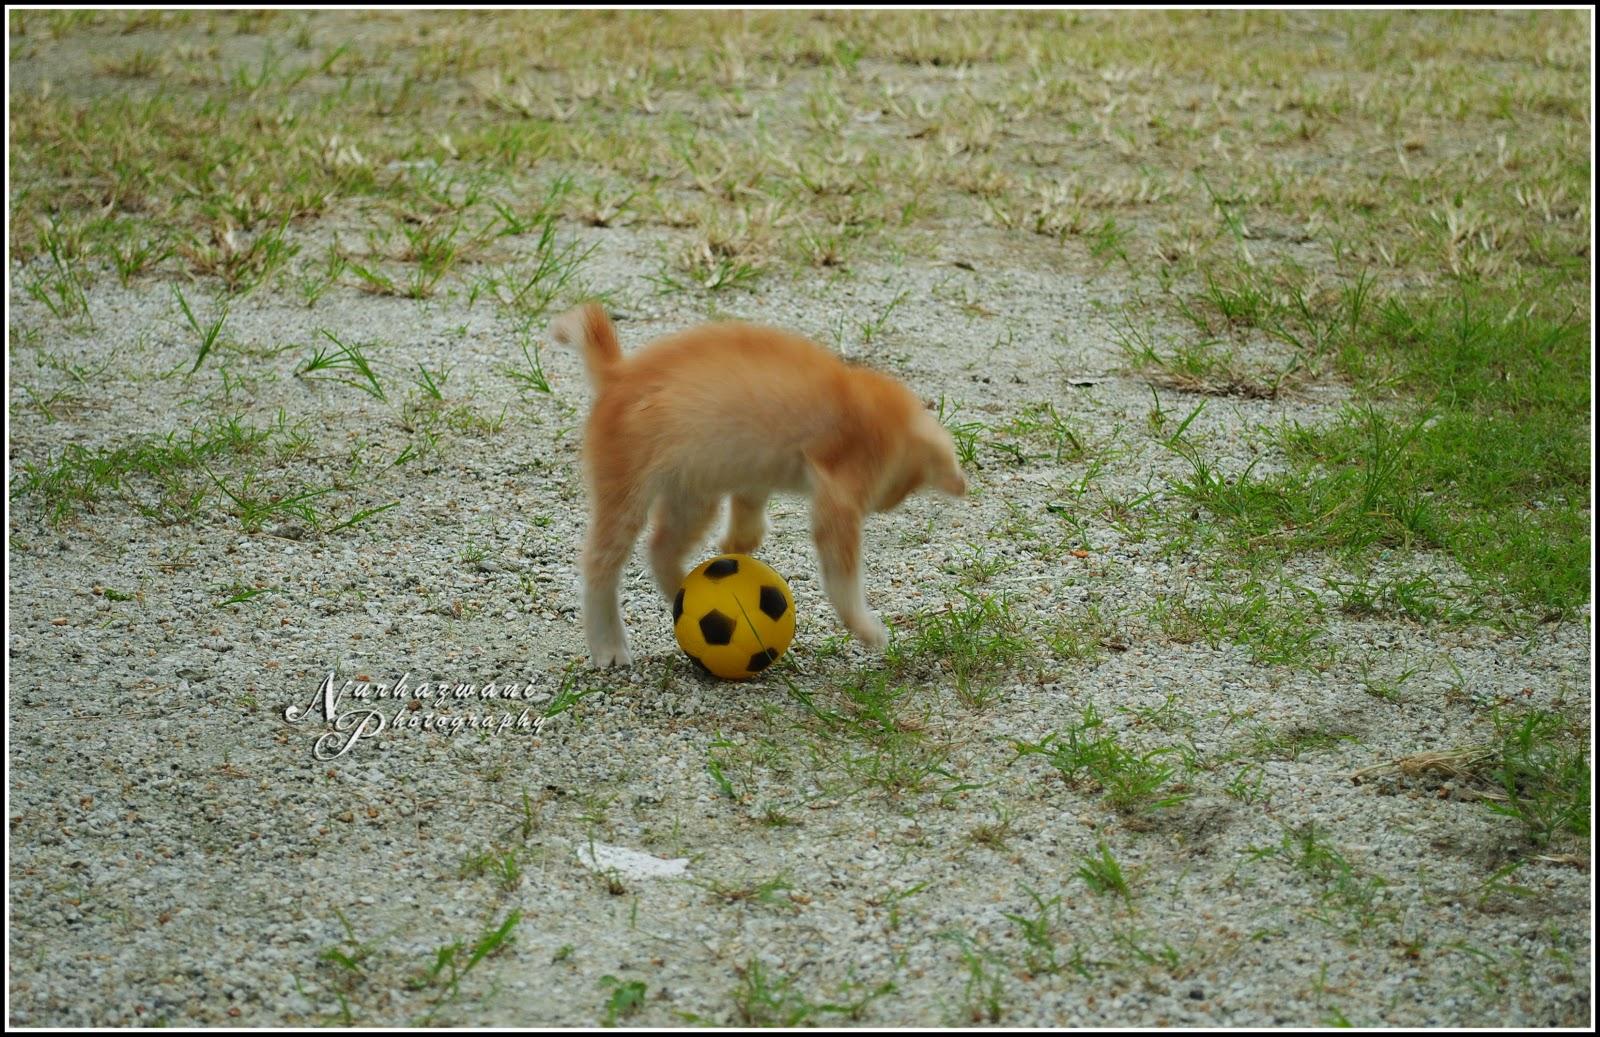 Gambar aksi pemain bola sepak malaysia